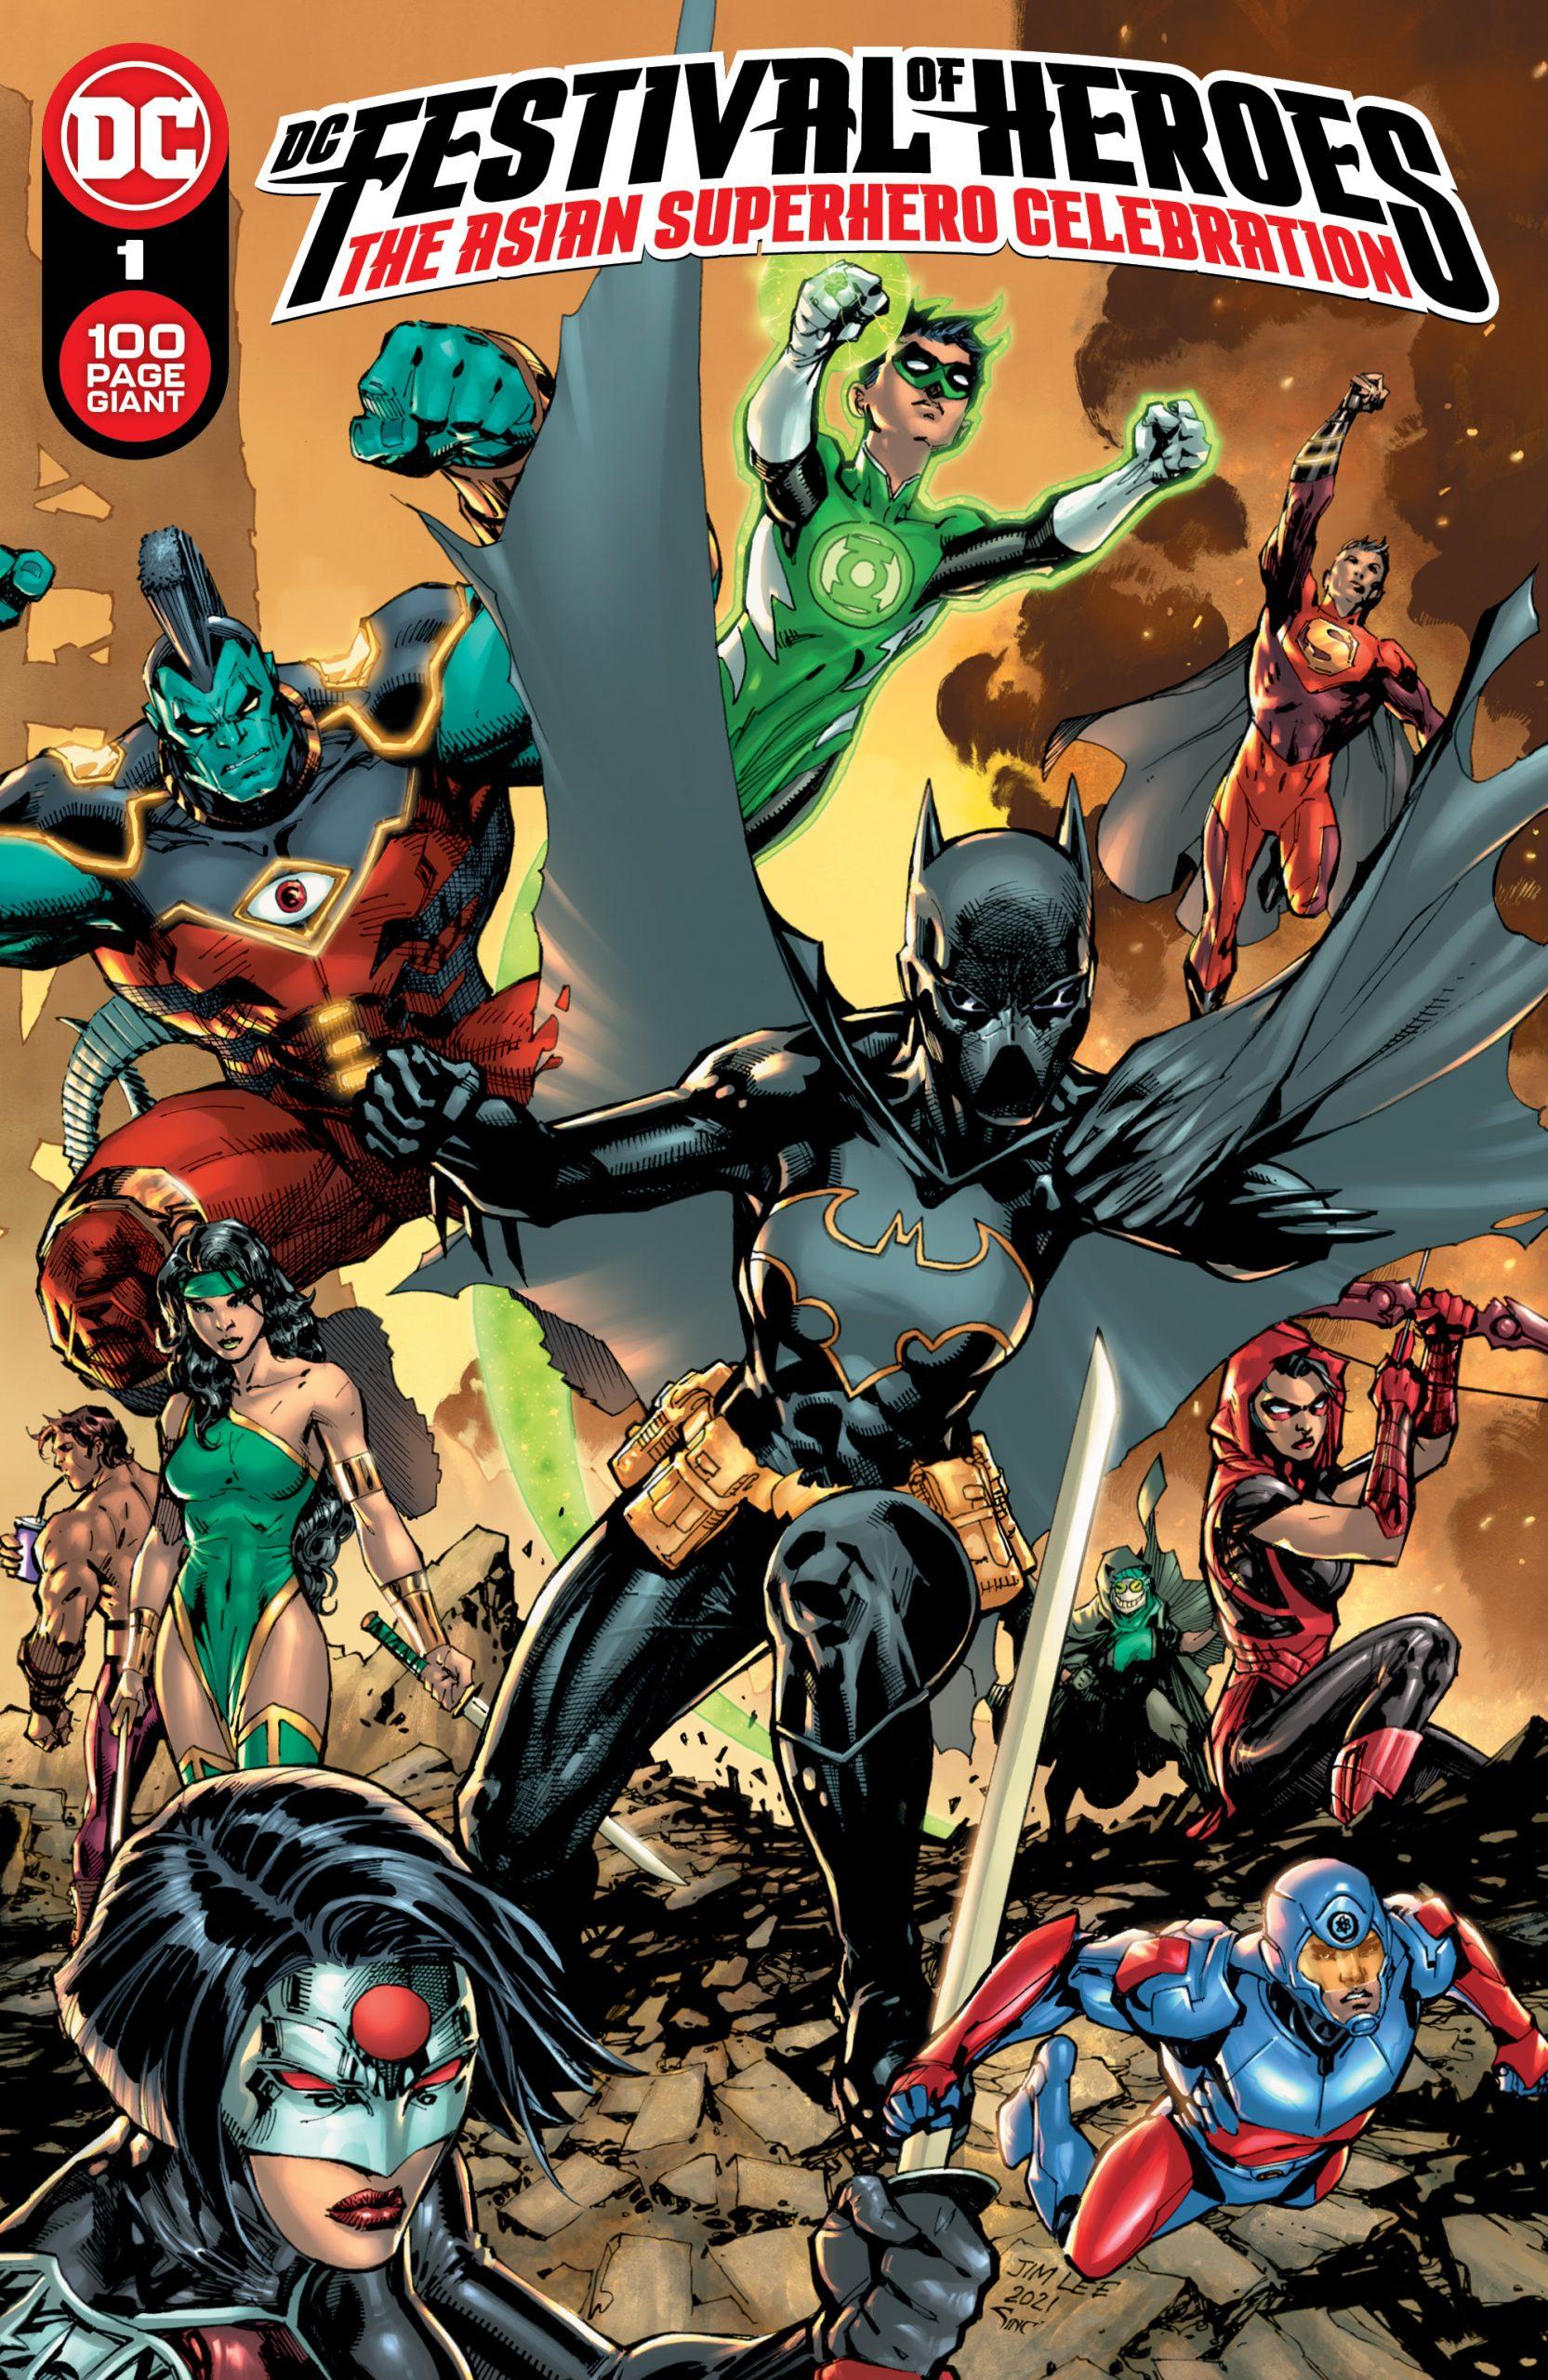 DC Festival Of Heroes - The Asian Superhero Celebration No 1